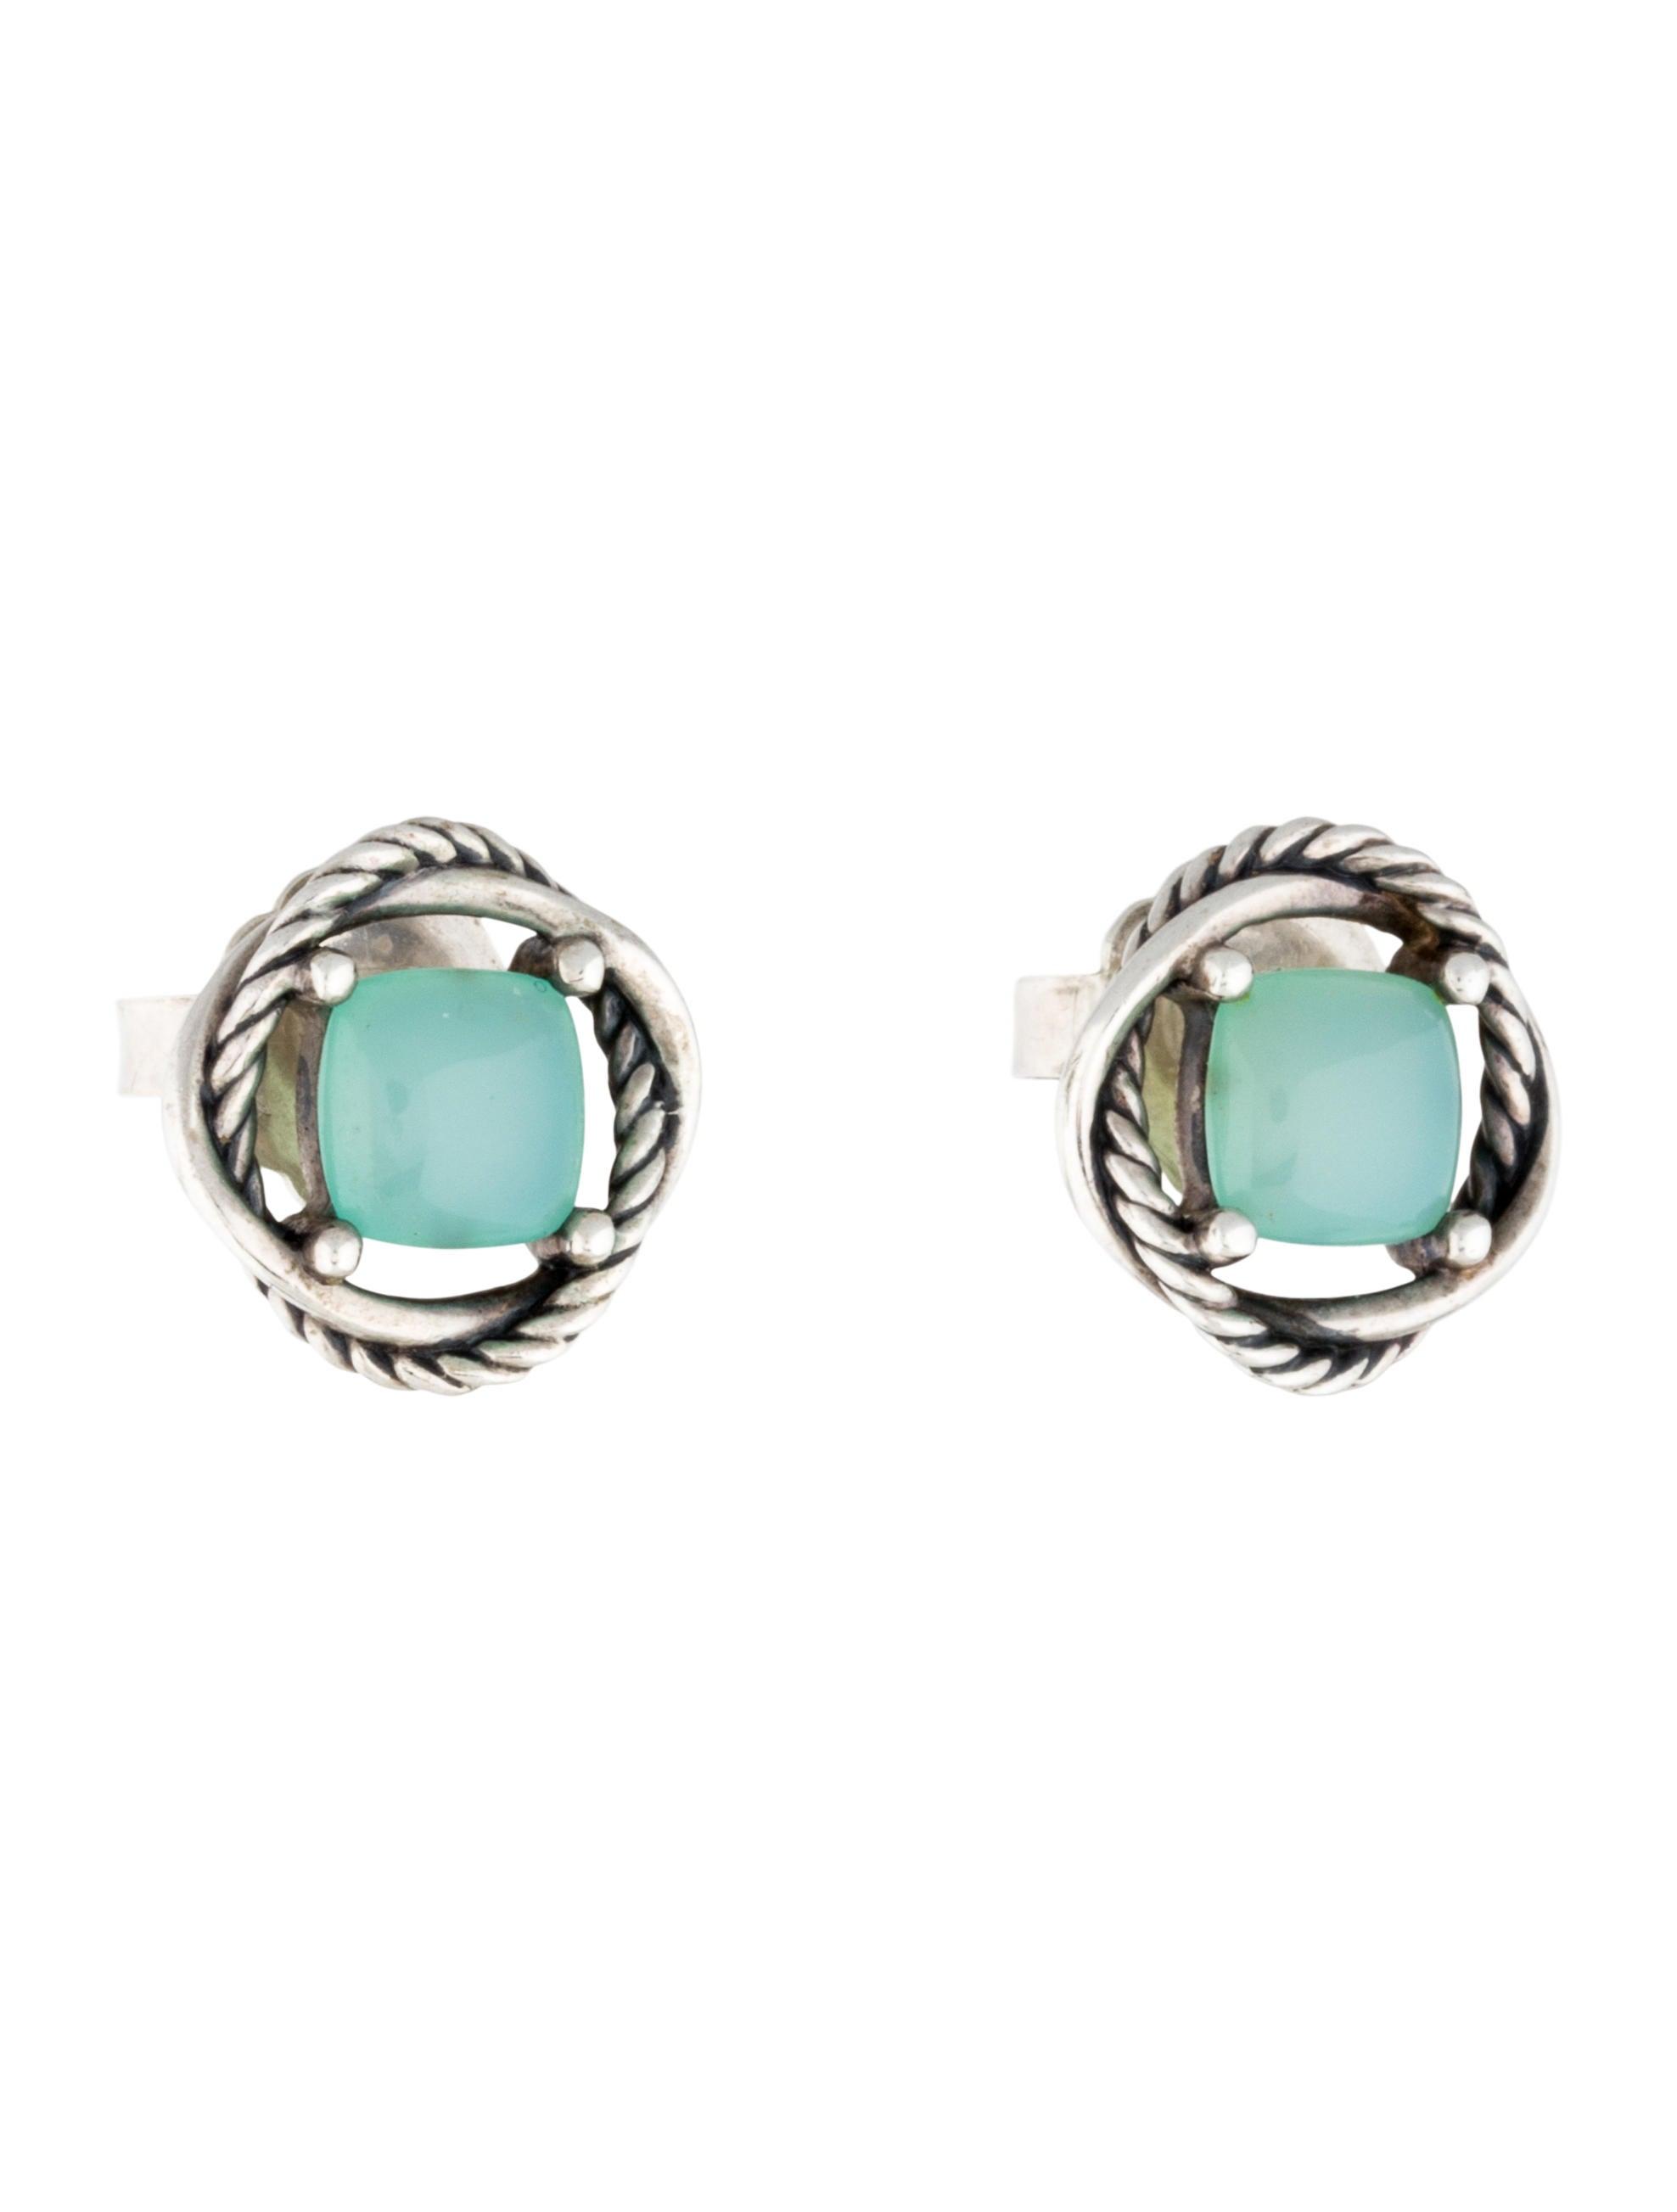 David yurman aqua chalcedony crossover earrings earrings for Apply for jewelry credit